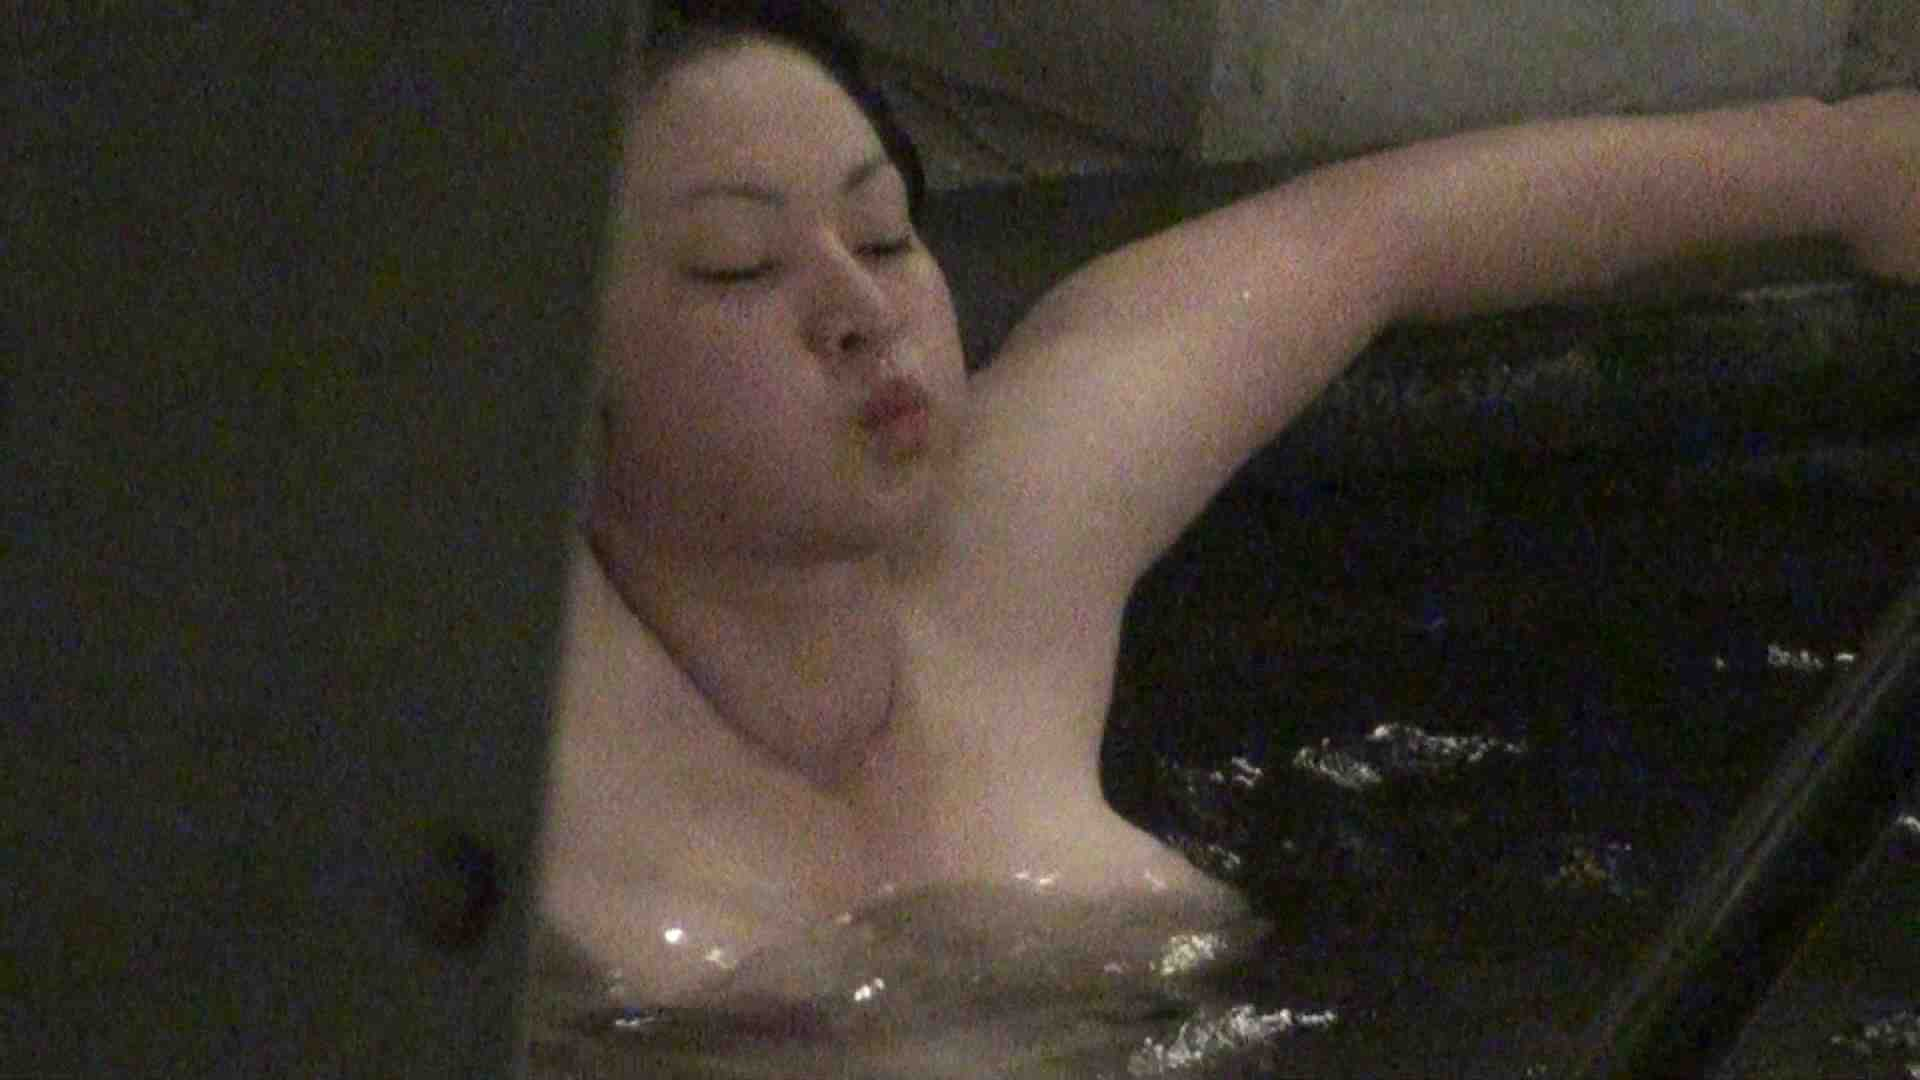 Aquaな露天風呂Vol.338 露天風呂編  82PIX 60